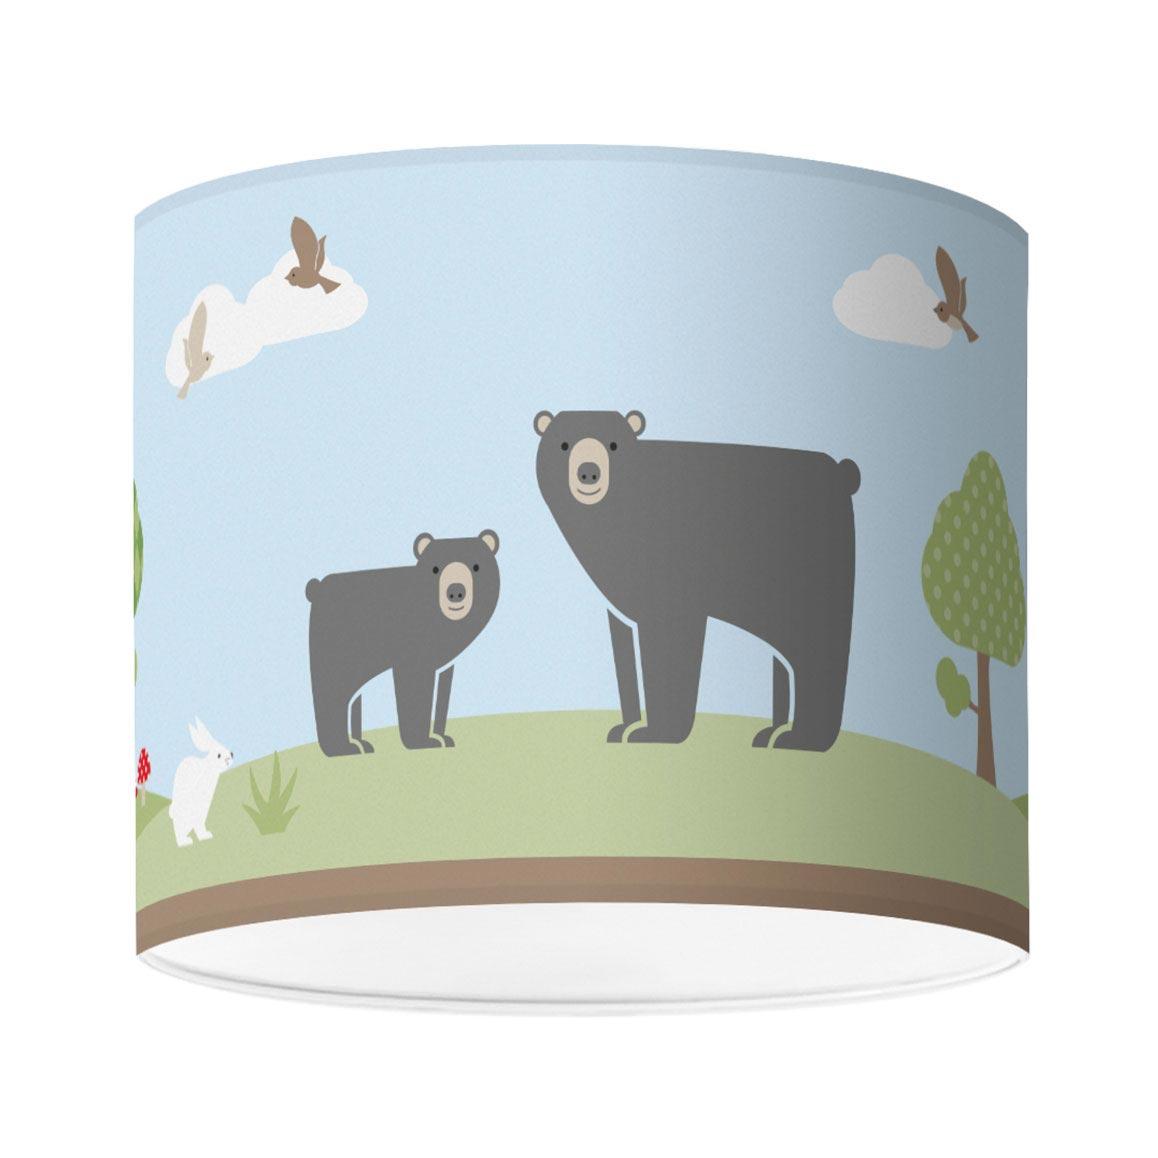 Kinderzimmerlampe mit Waldmotiv, Bears